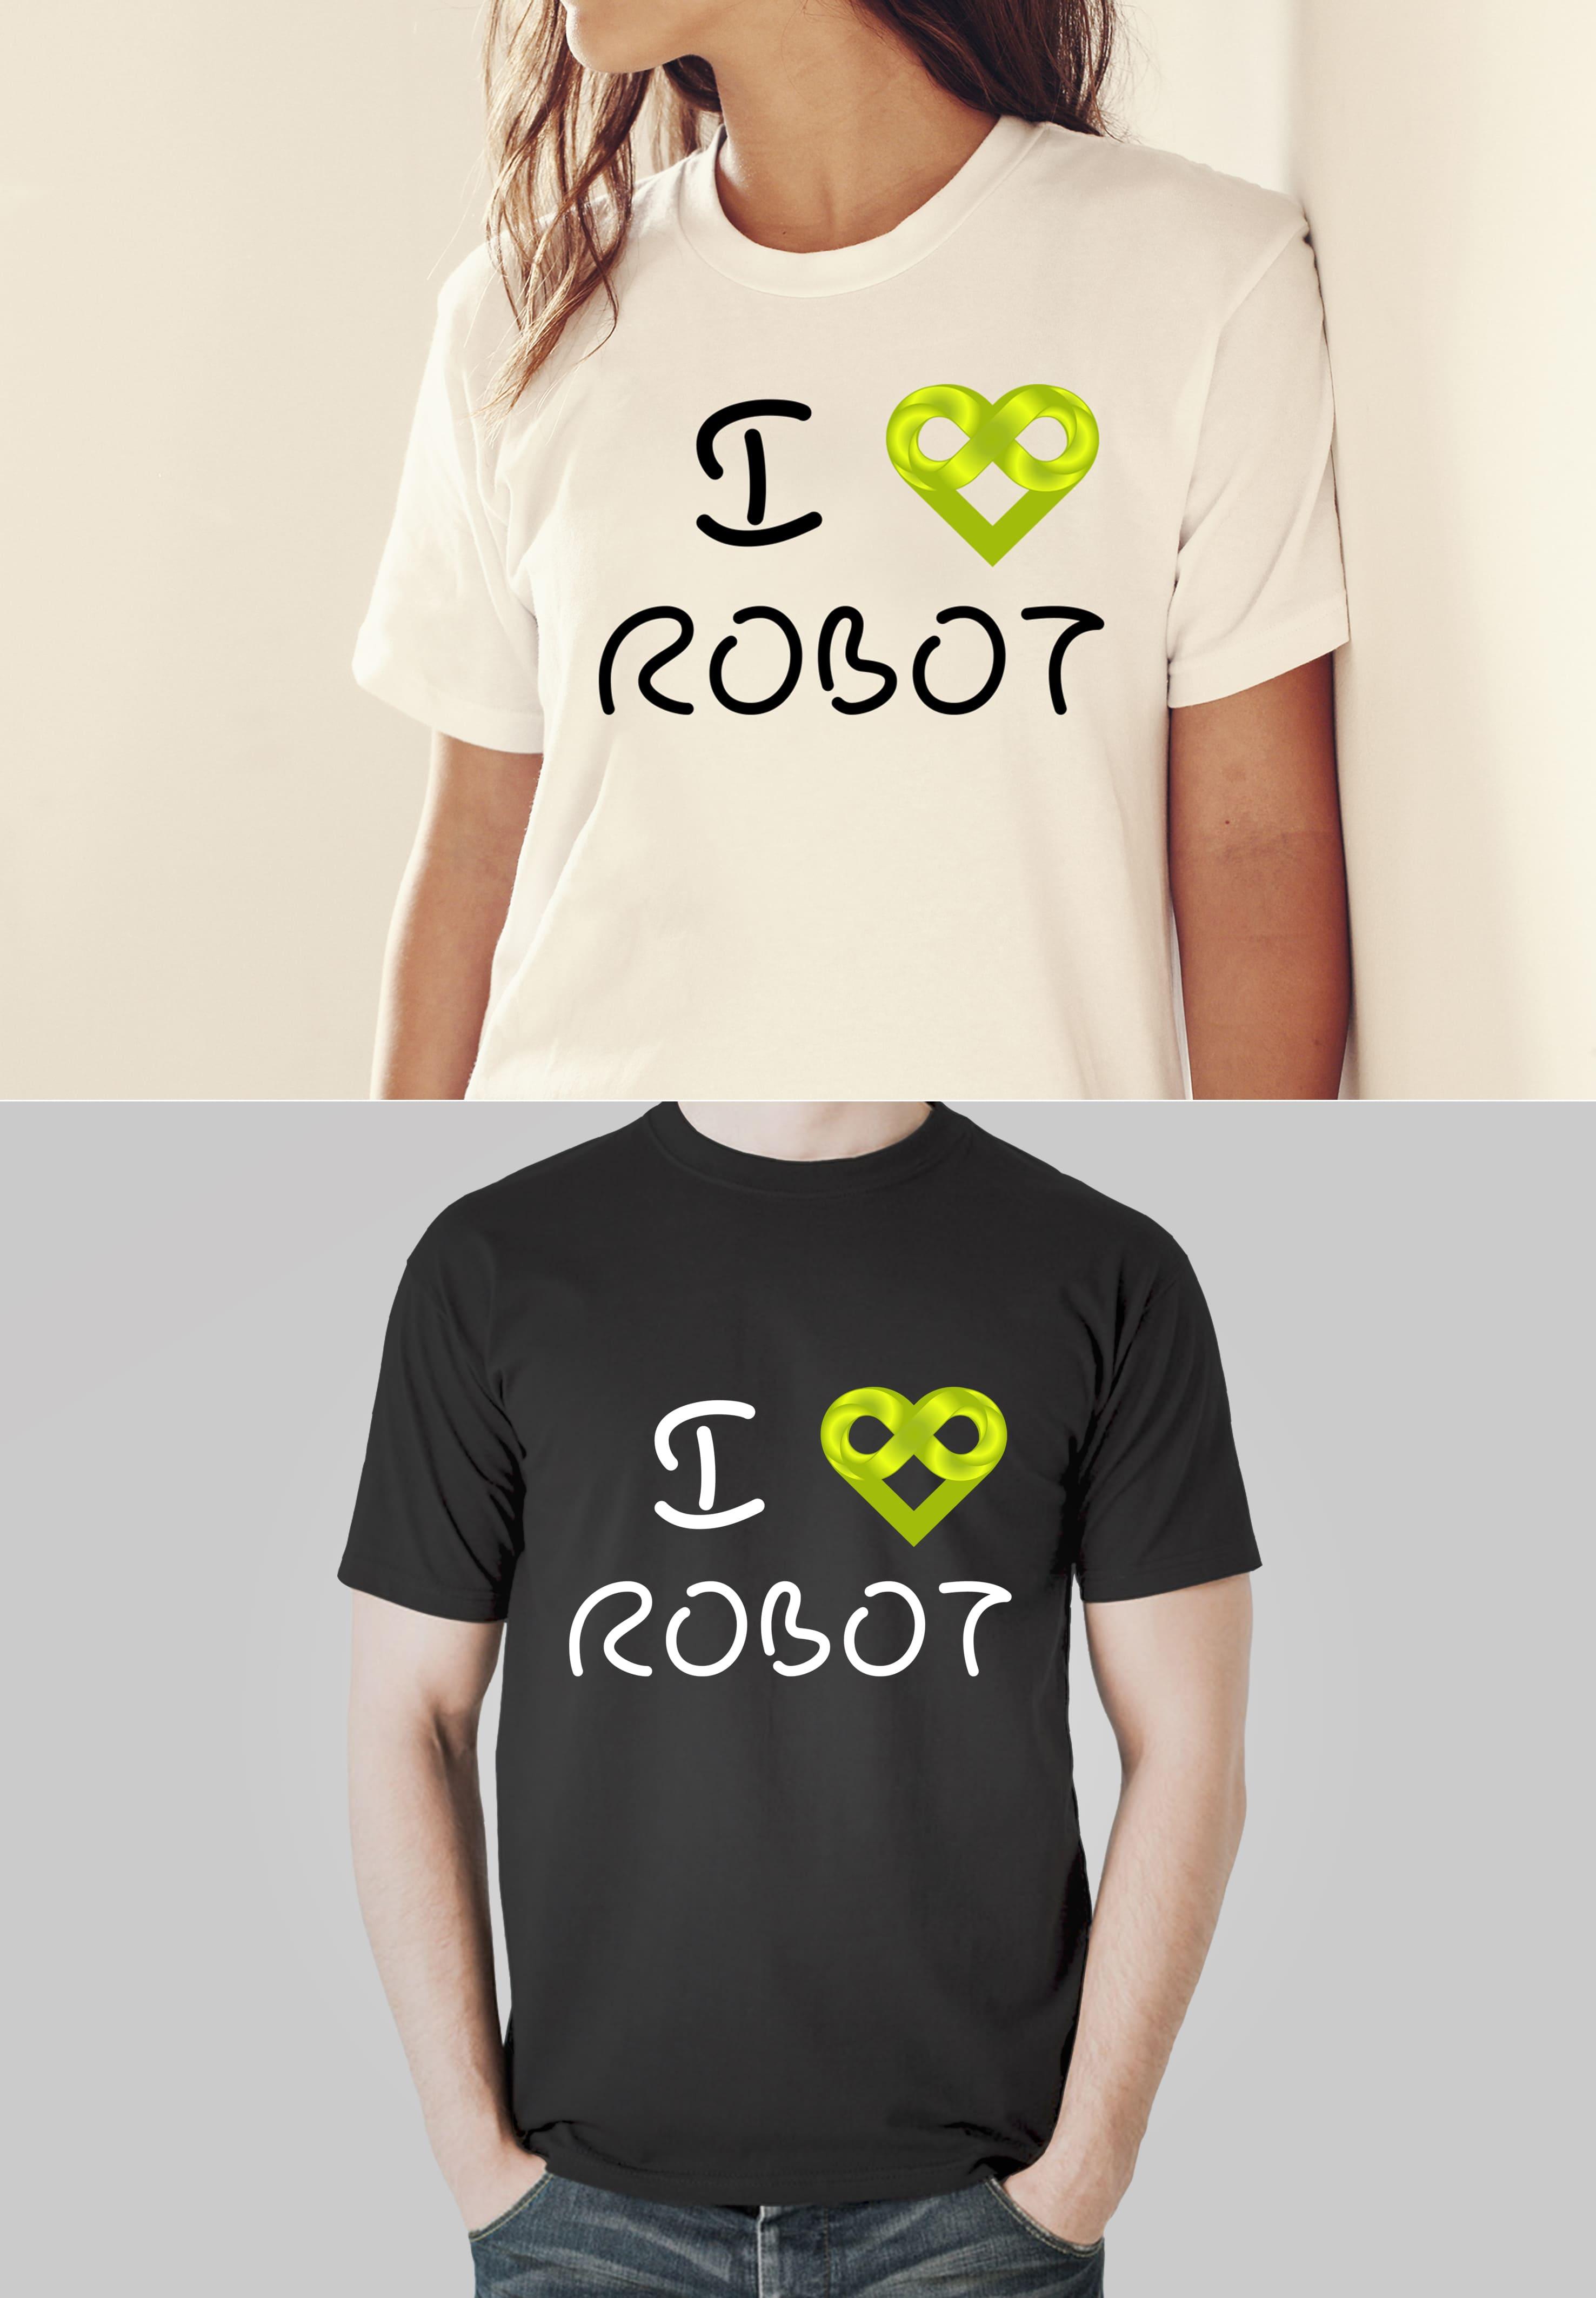 Нарисовать принты на футболки для компании Моторика фото f_94360a63db534395.jpg